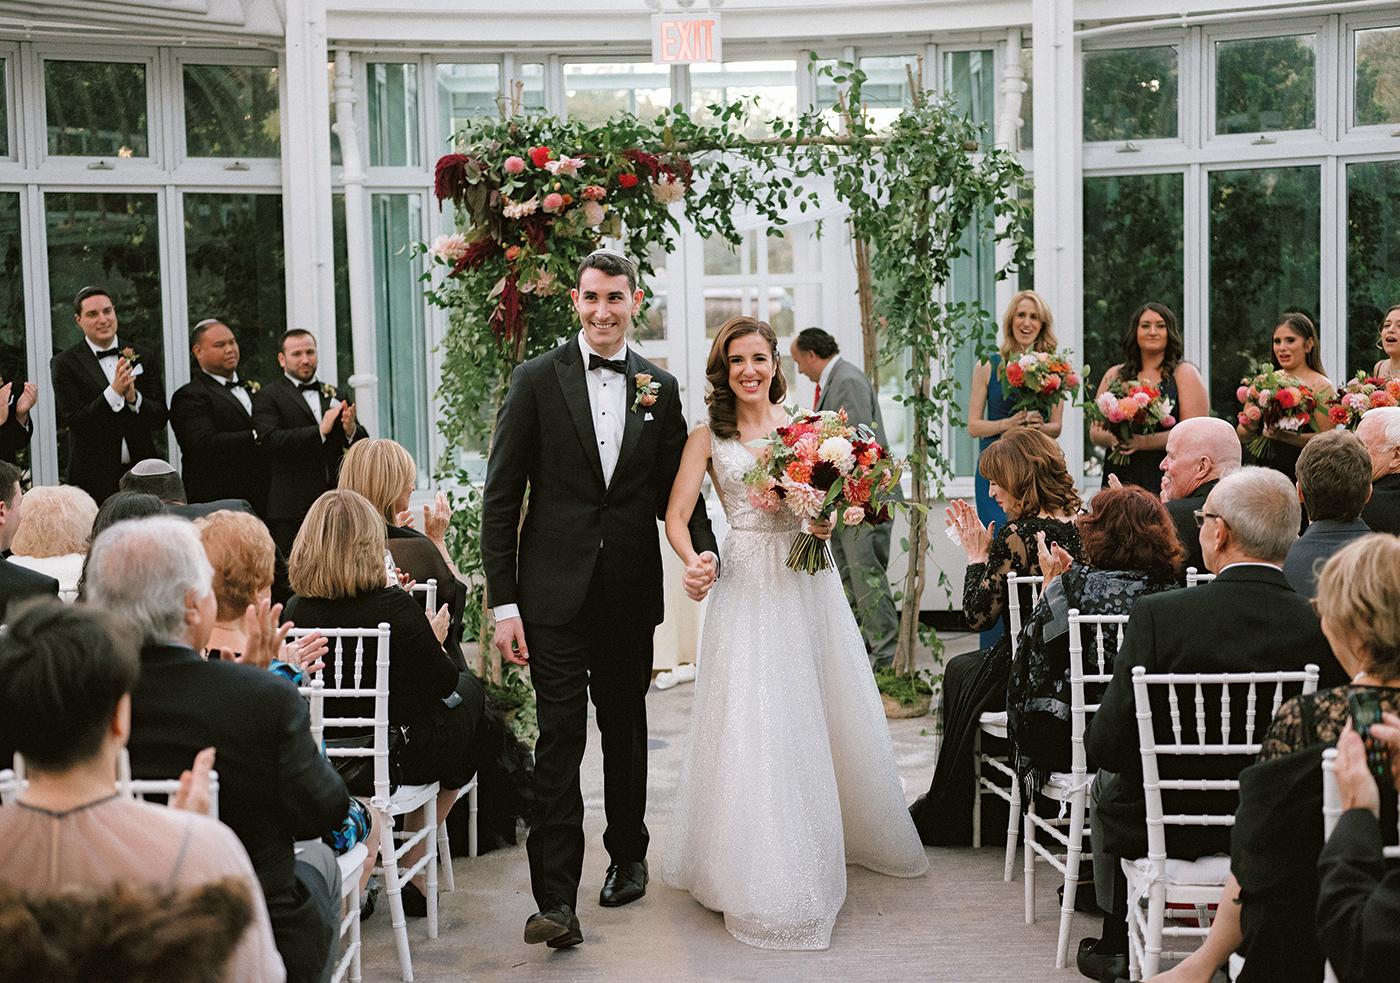 Nicole & Scott's Wedding at the Brooklyn Botanic Garden NY